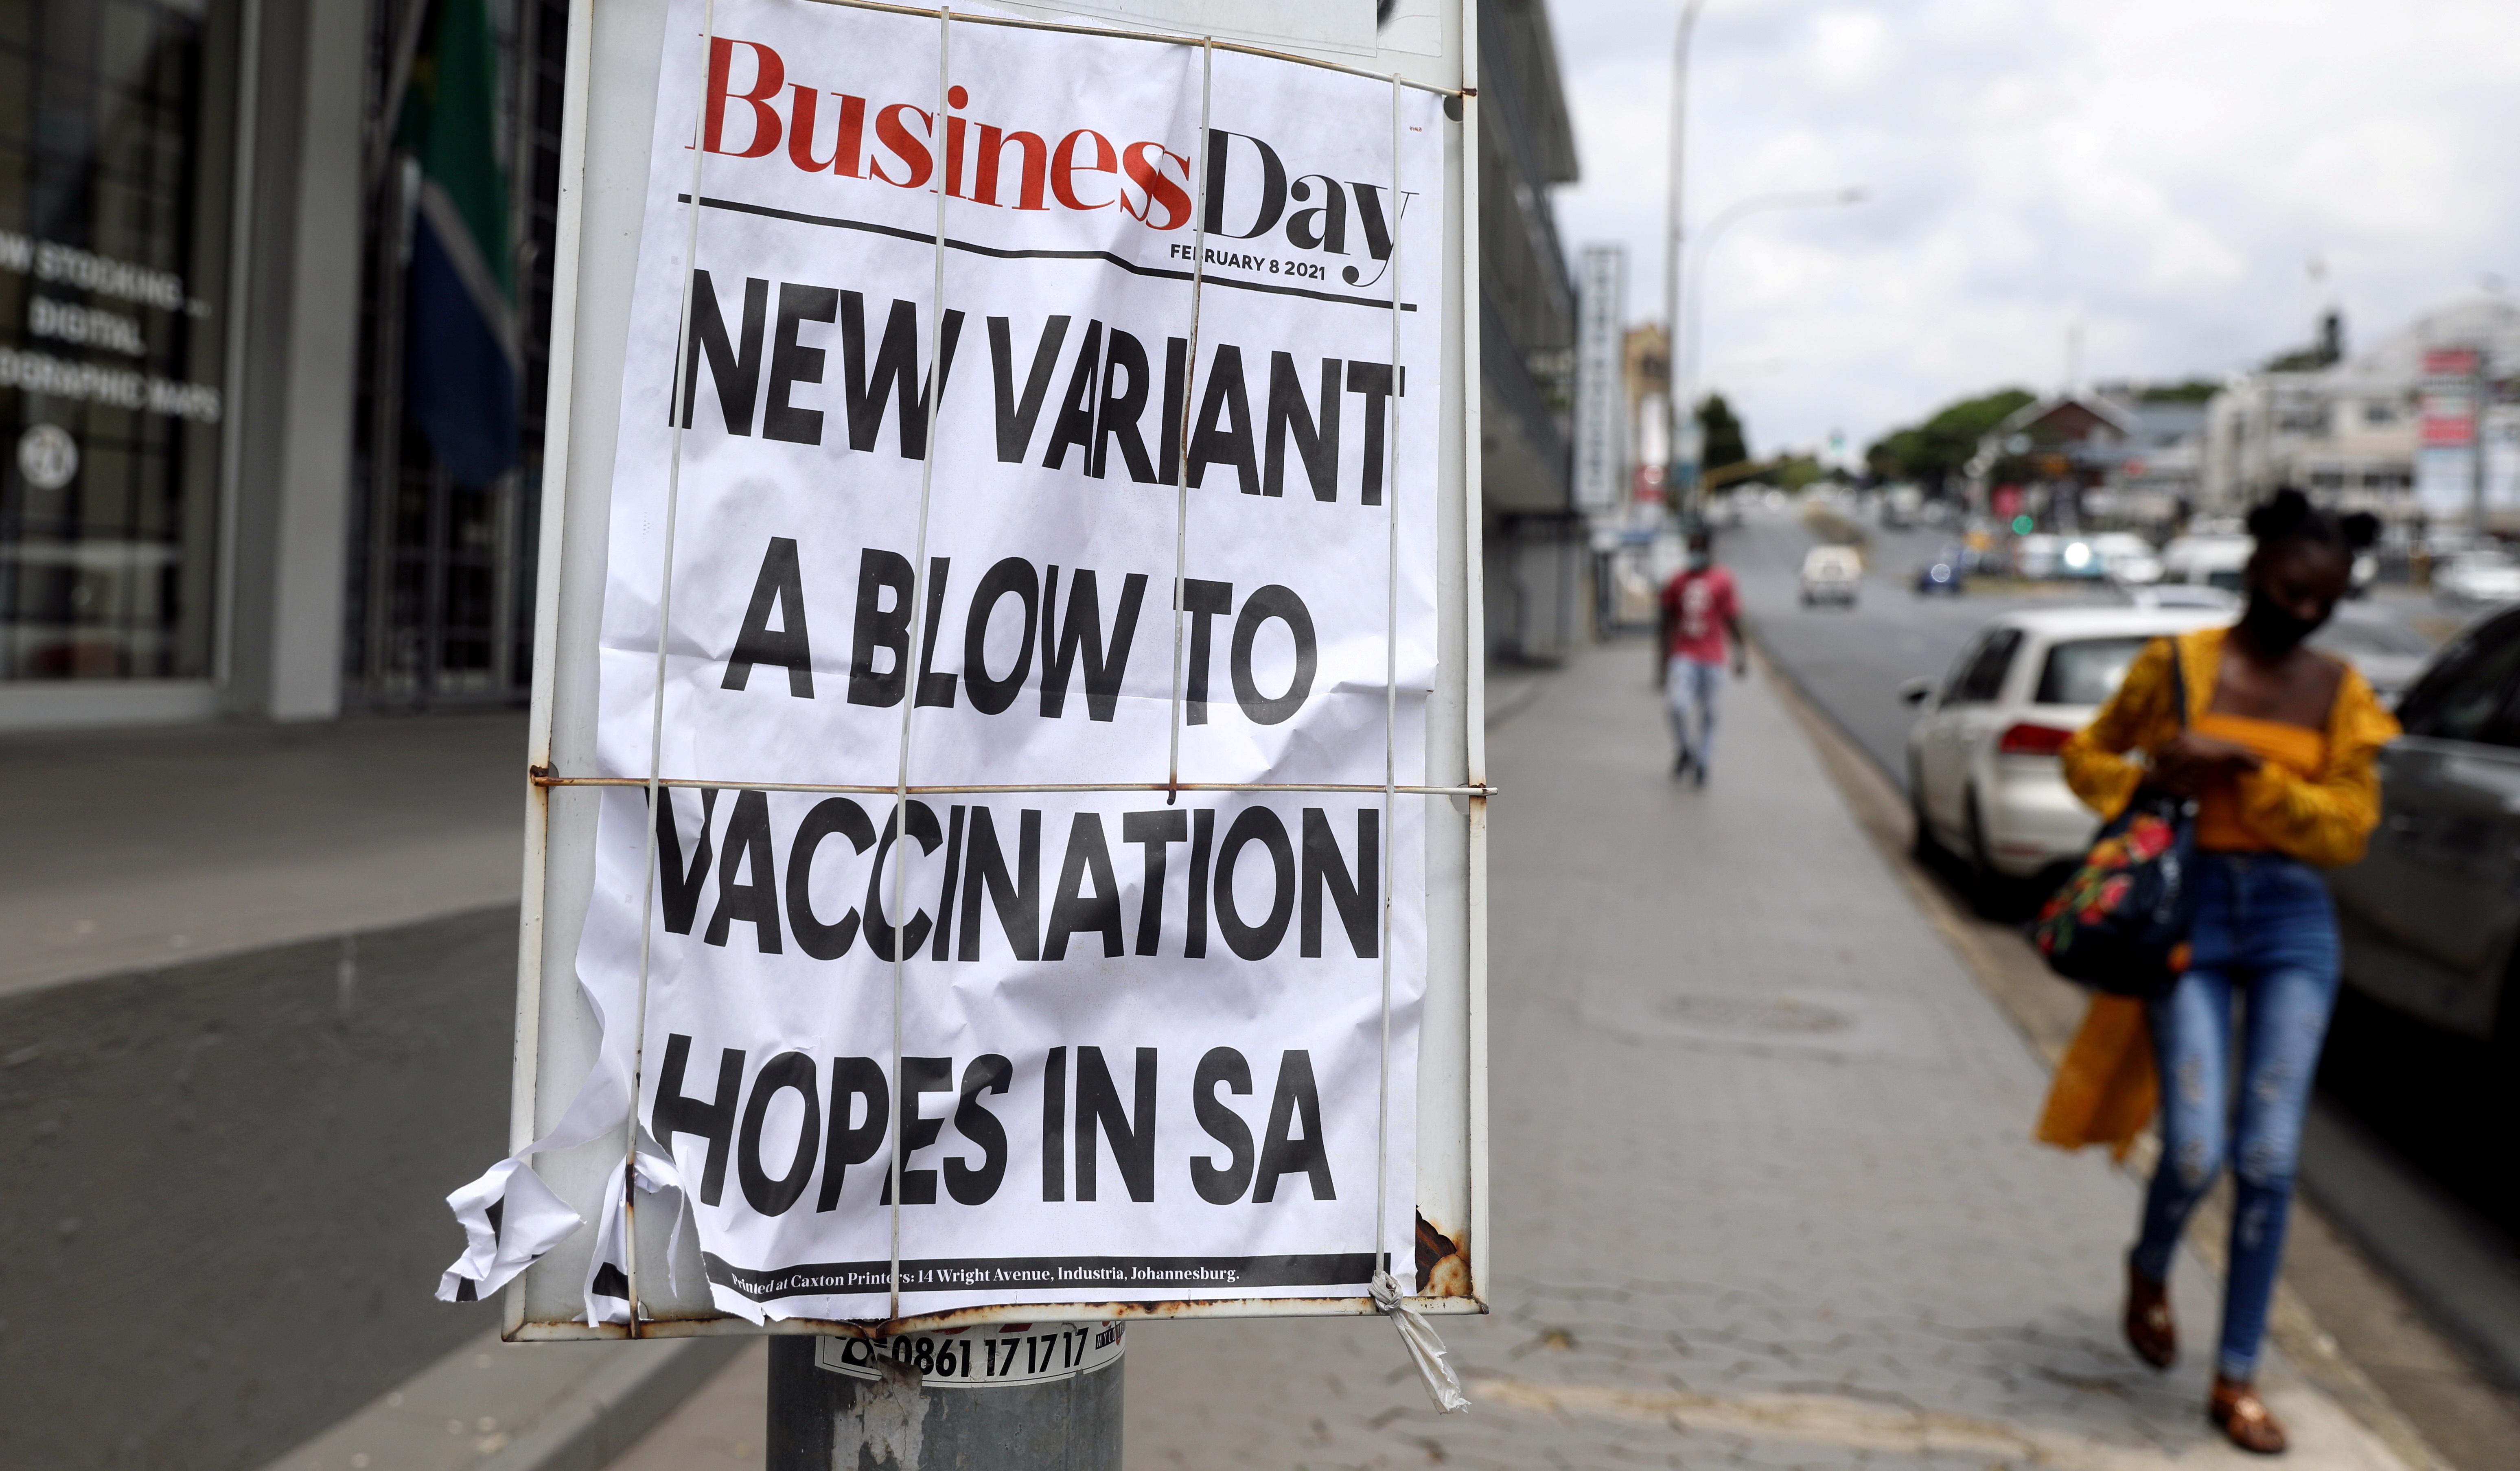 A woman walks past newspaper billboards during the coronavirus disease (COVID-19) outbreak in Johannesburg, South Africa, February 8, 2021. REUTERS/Sumaya Hisham